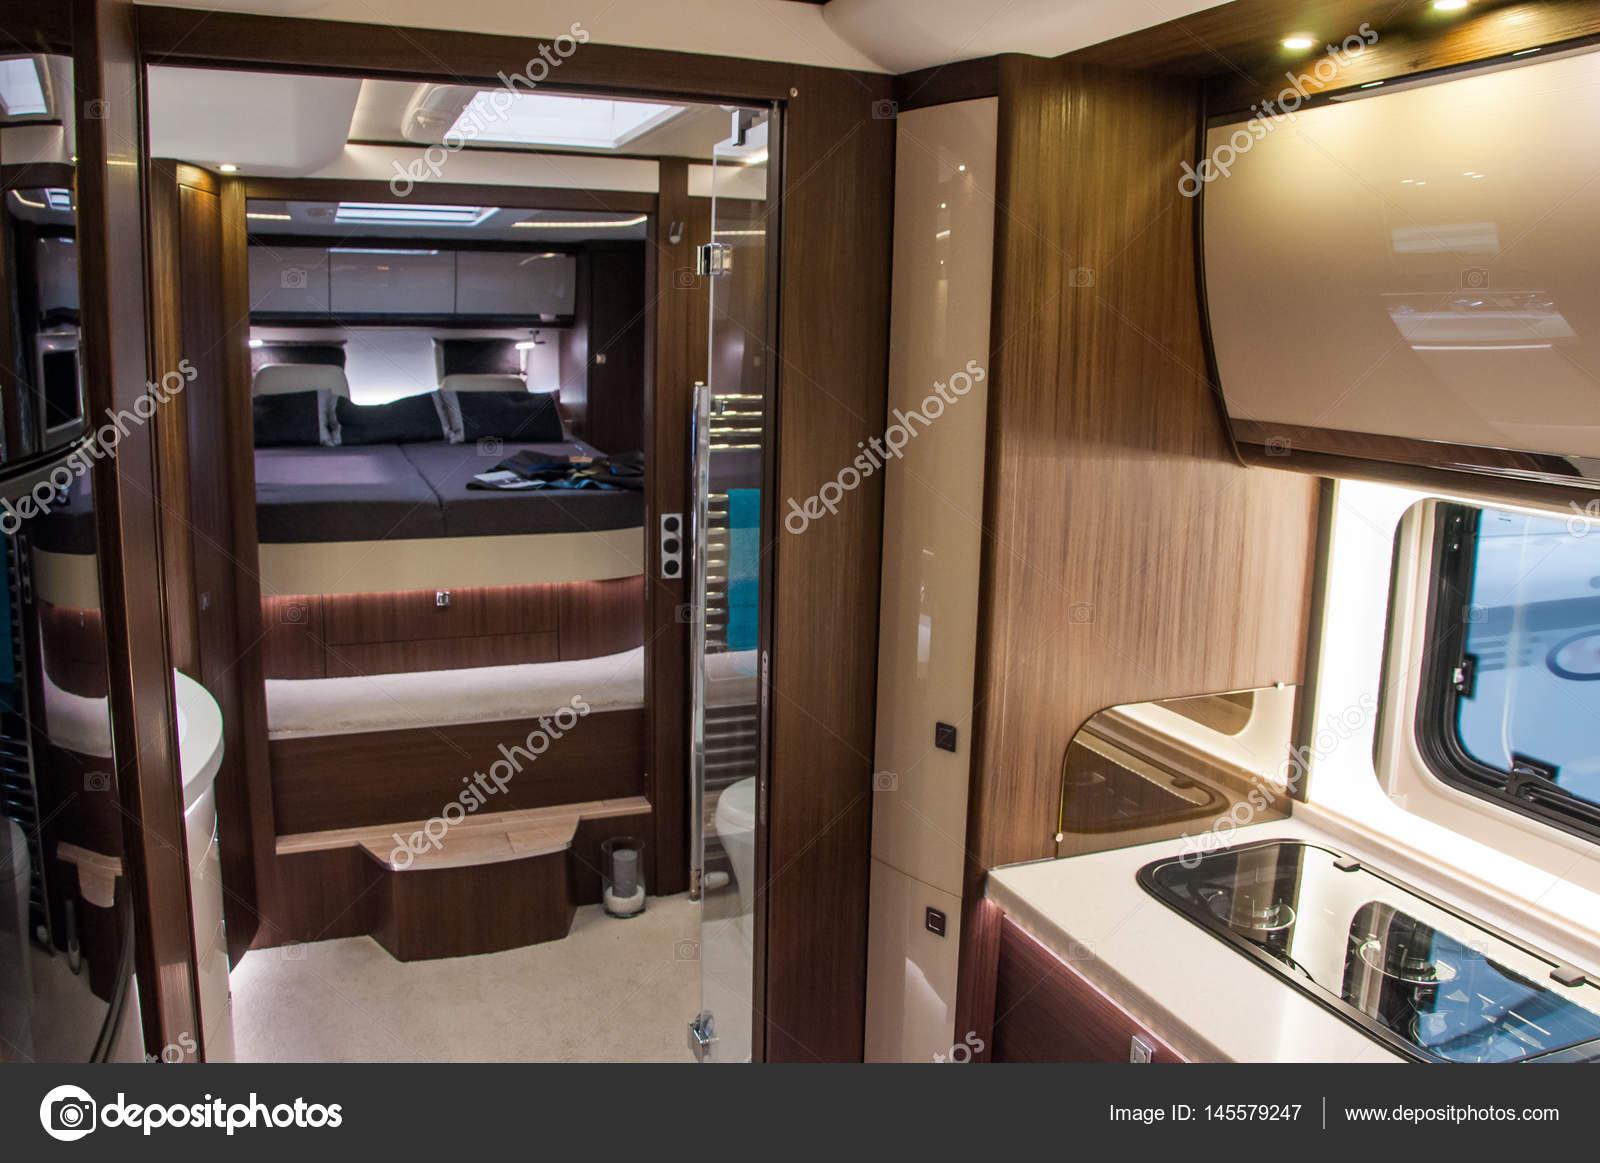 caravane interieur rnovation de ma caravane intrieur. Black Bedroom Furniture Sets. Home Design Ideas